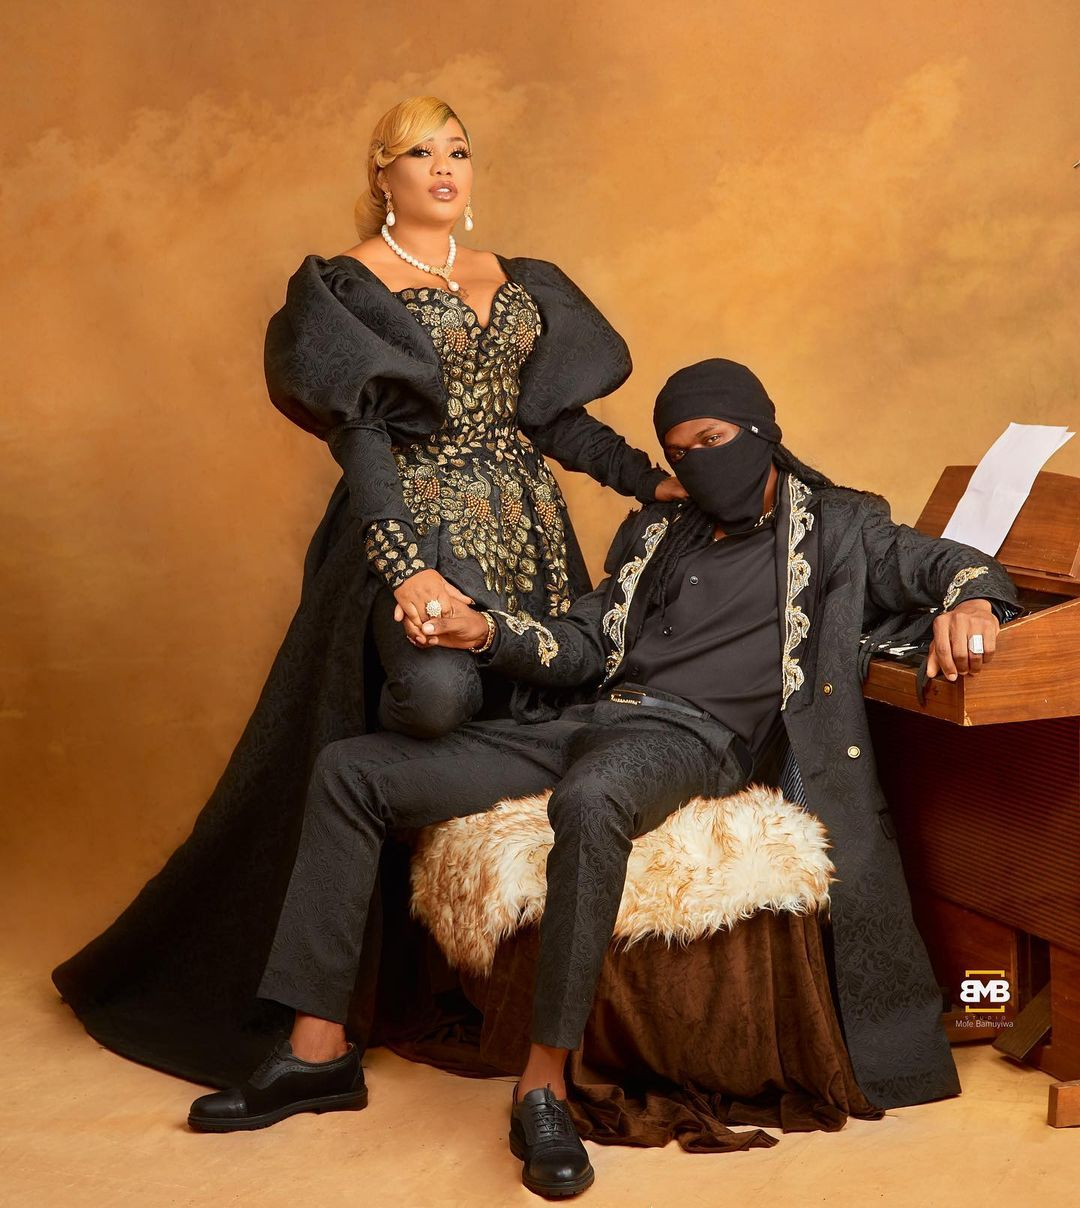 #TheArtistAndHisMuse2021: Tiannah Set To Wed Her Fiancé Segun Adebayo